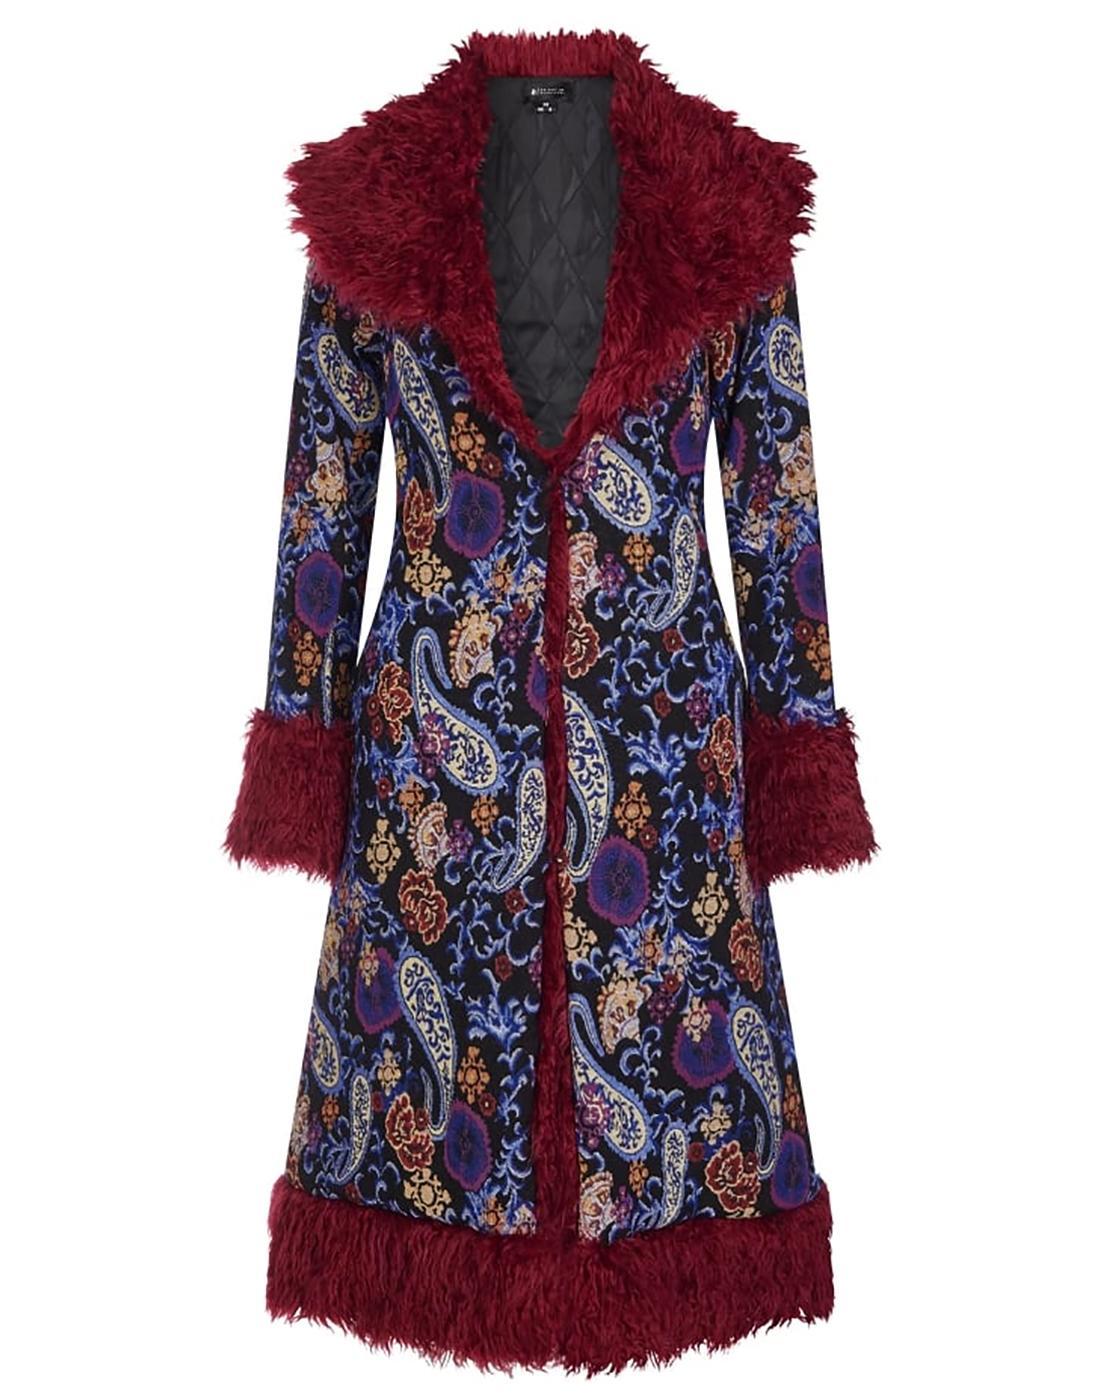 Nadia BRIGHT & BEAUTIFUL Retro 70s Paisley Coat